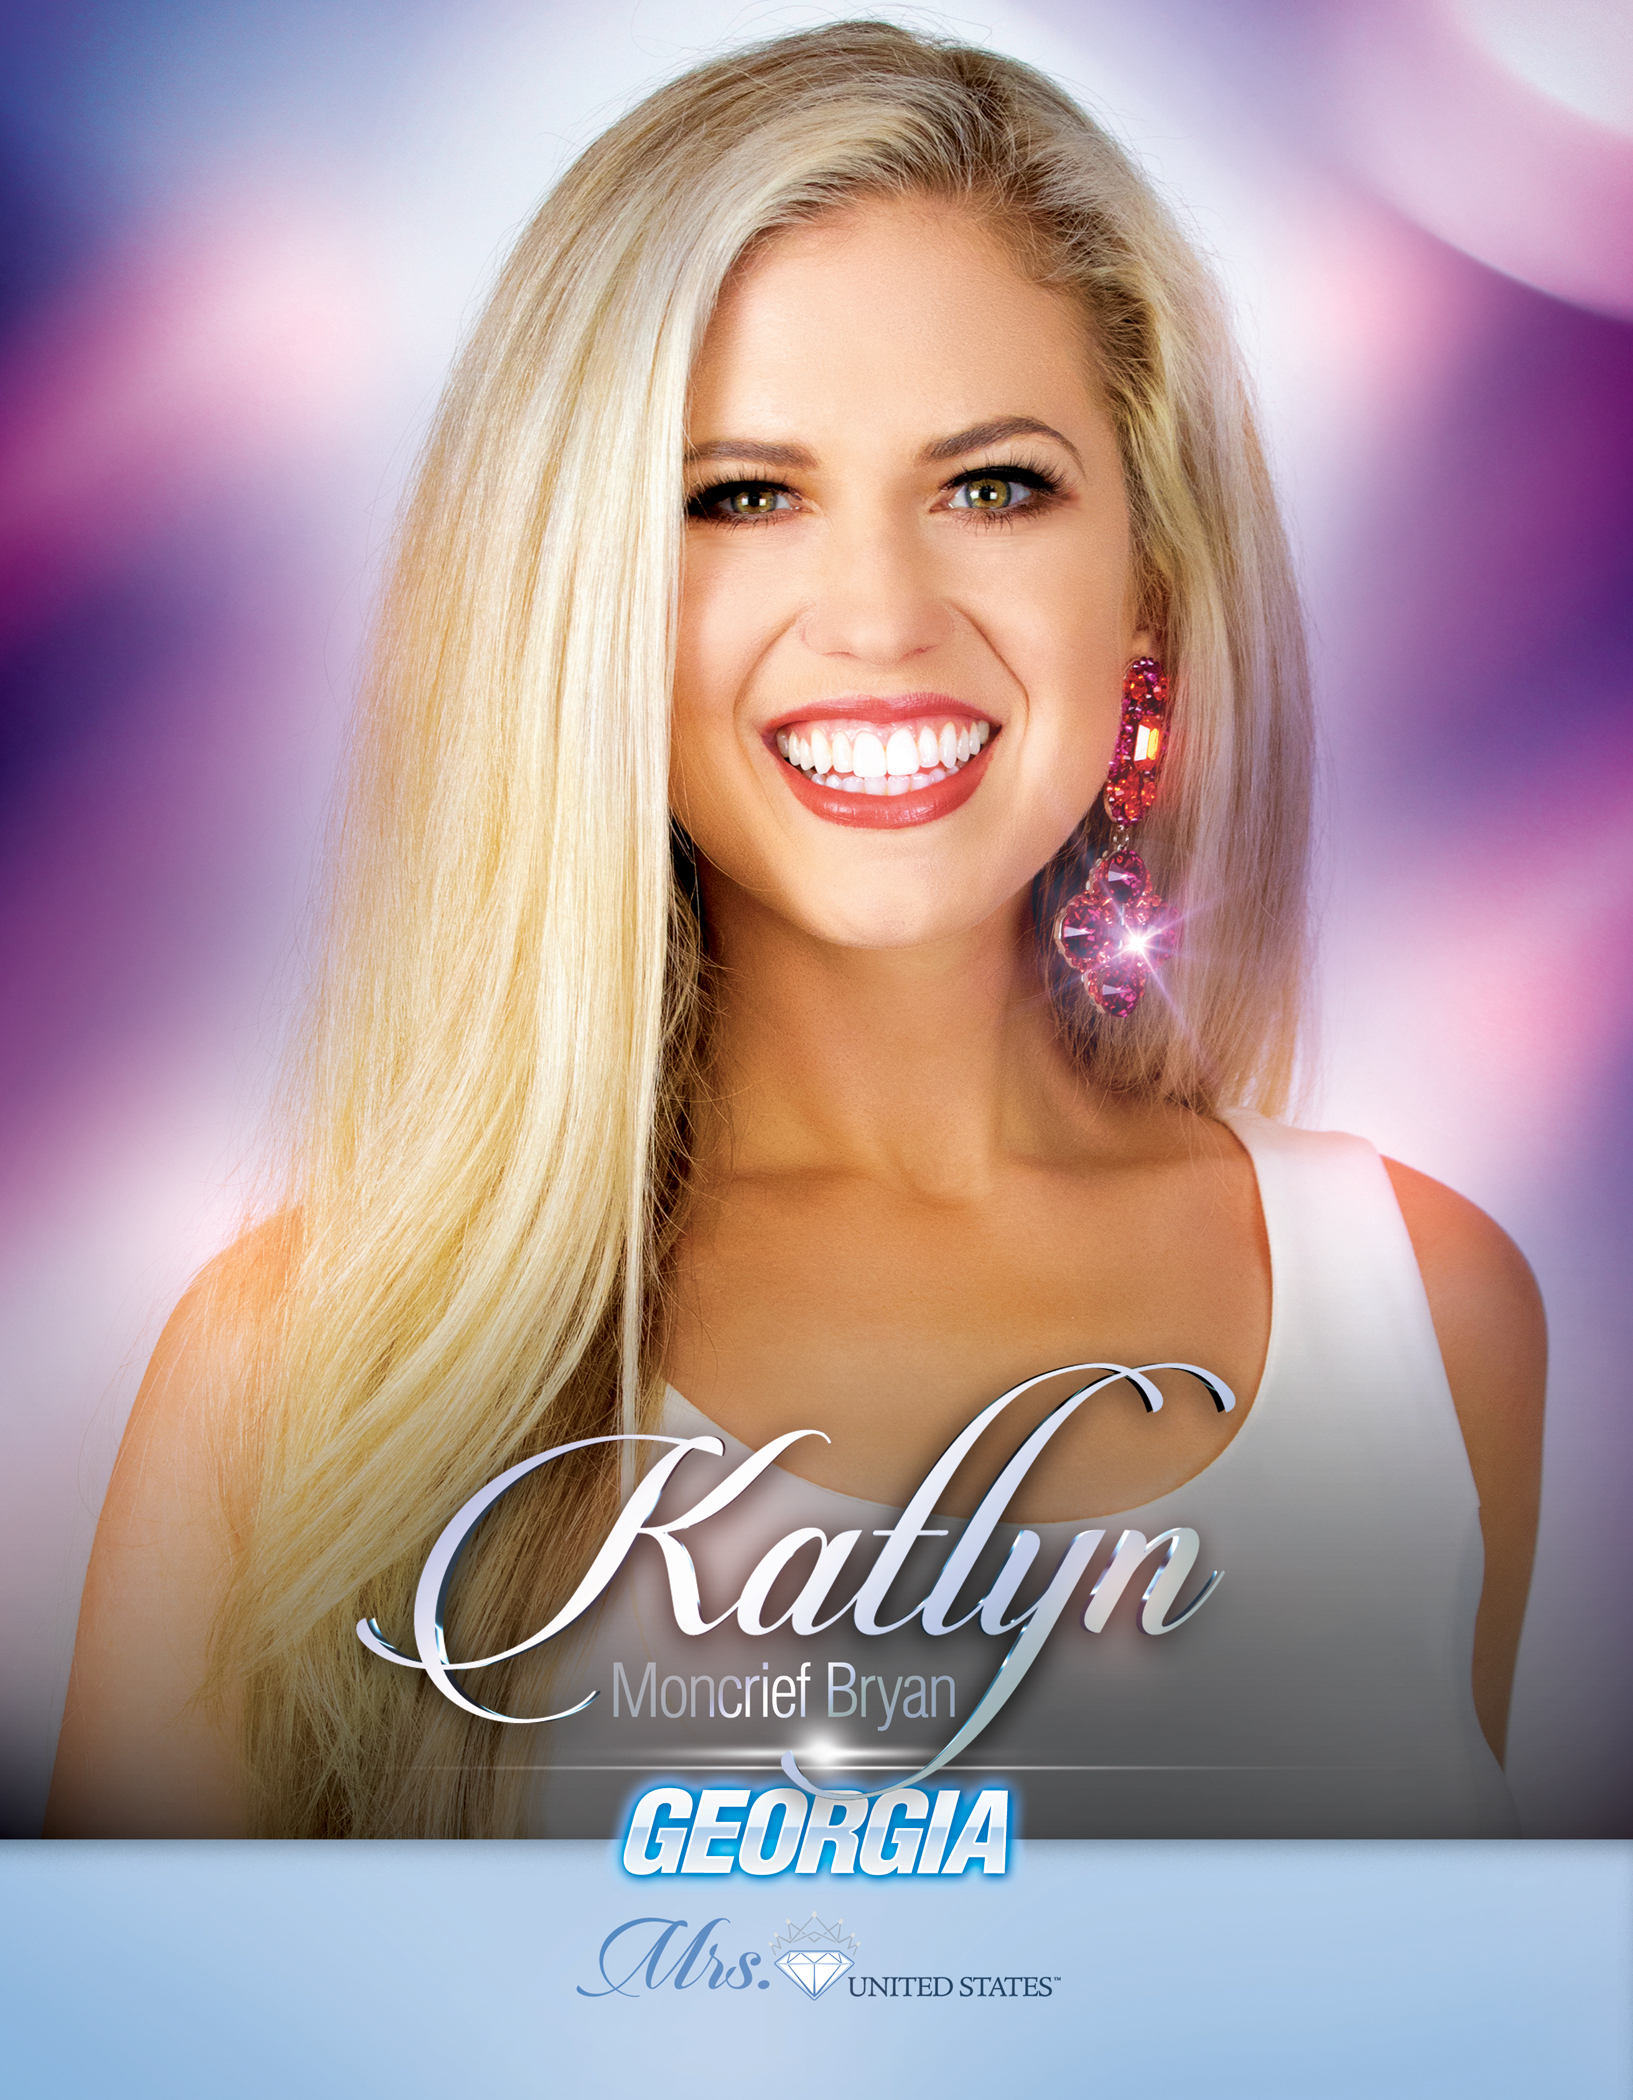 Katlyn Moncrief Bryan Mrs. Georgia United States - 2019